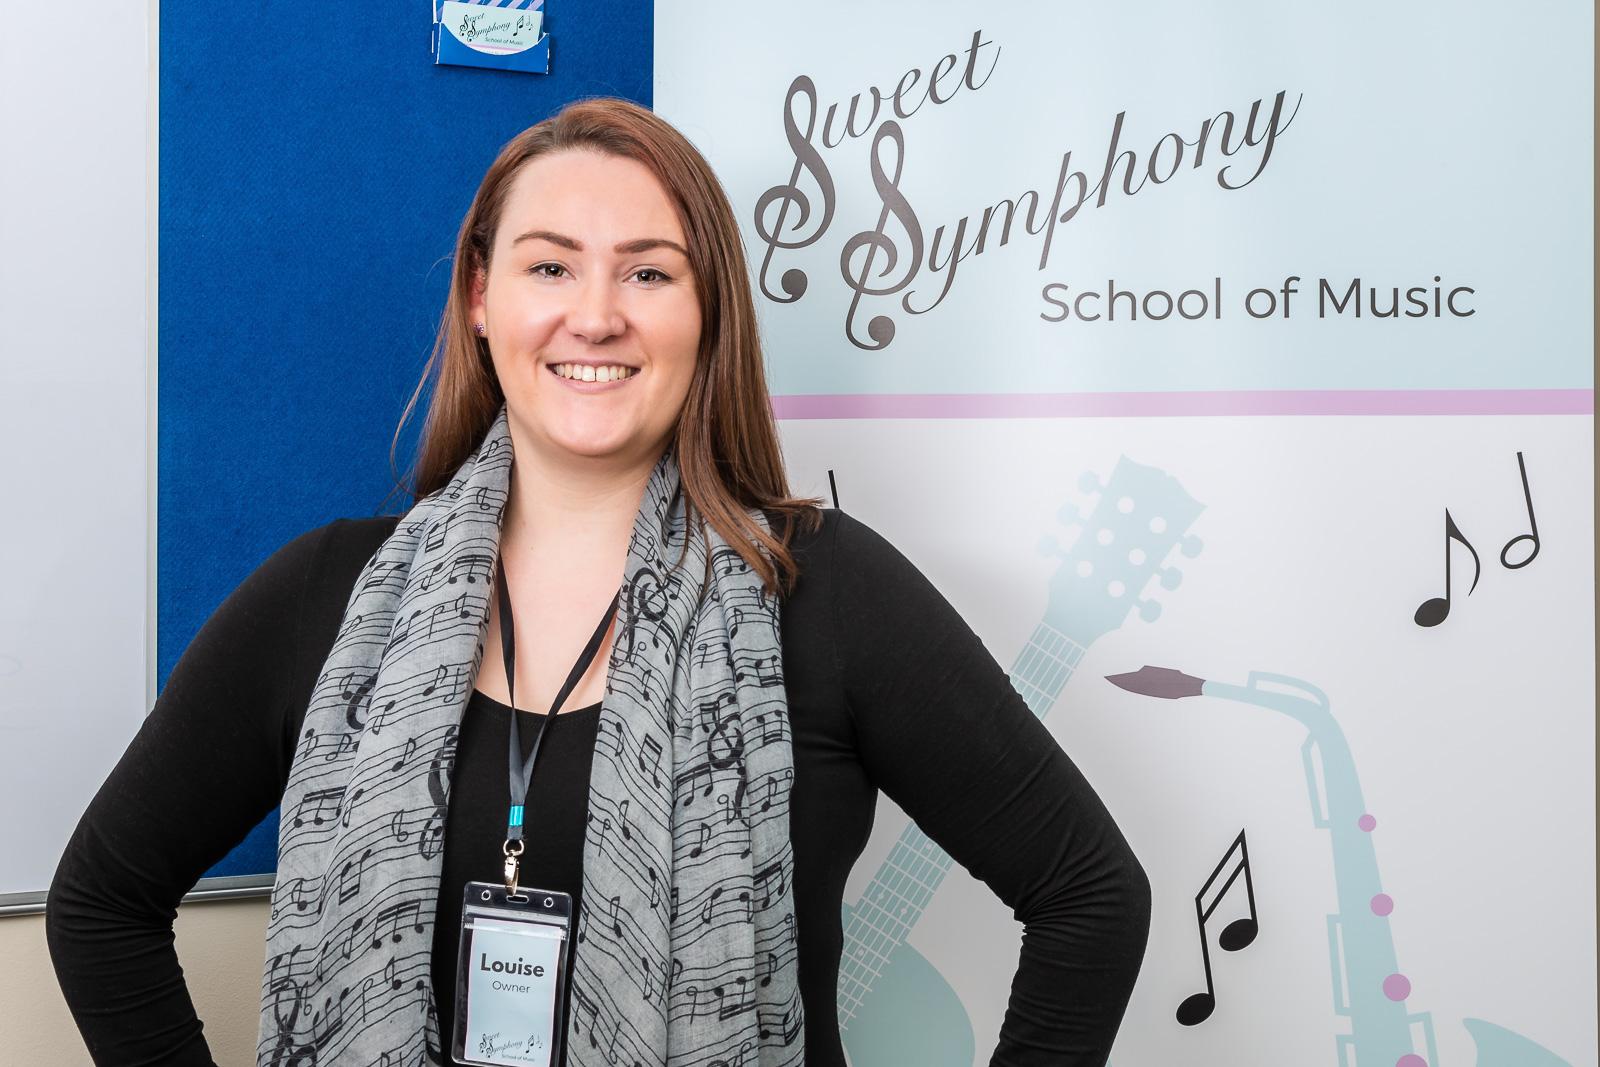 Louise Jones, owner of Sweet Symphony School of Music